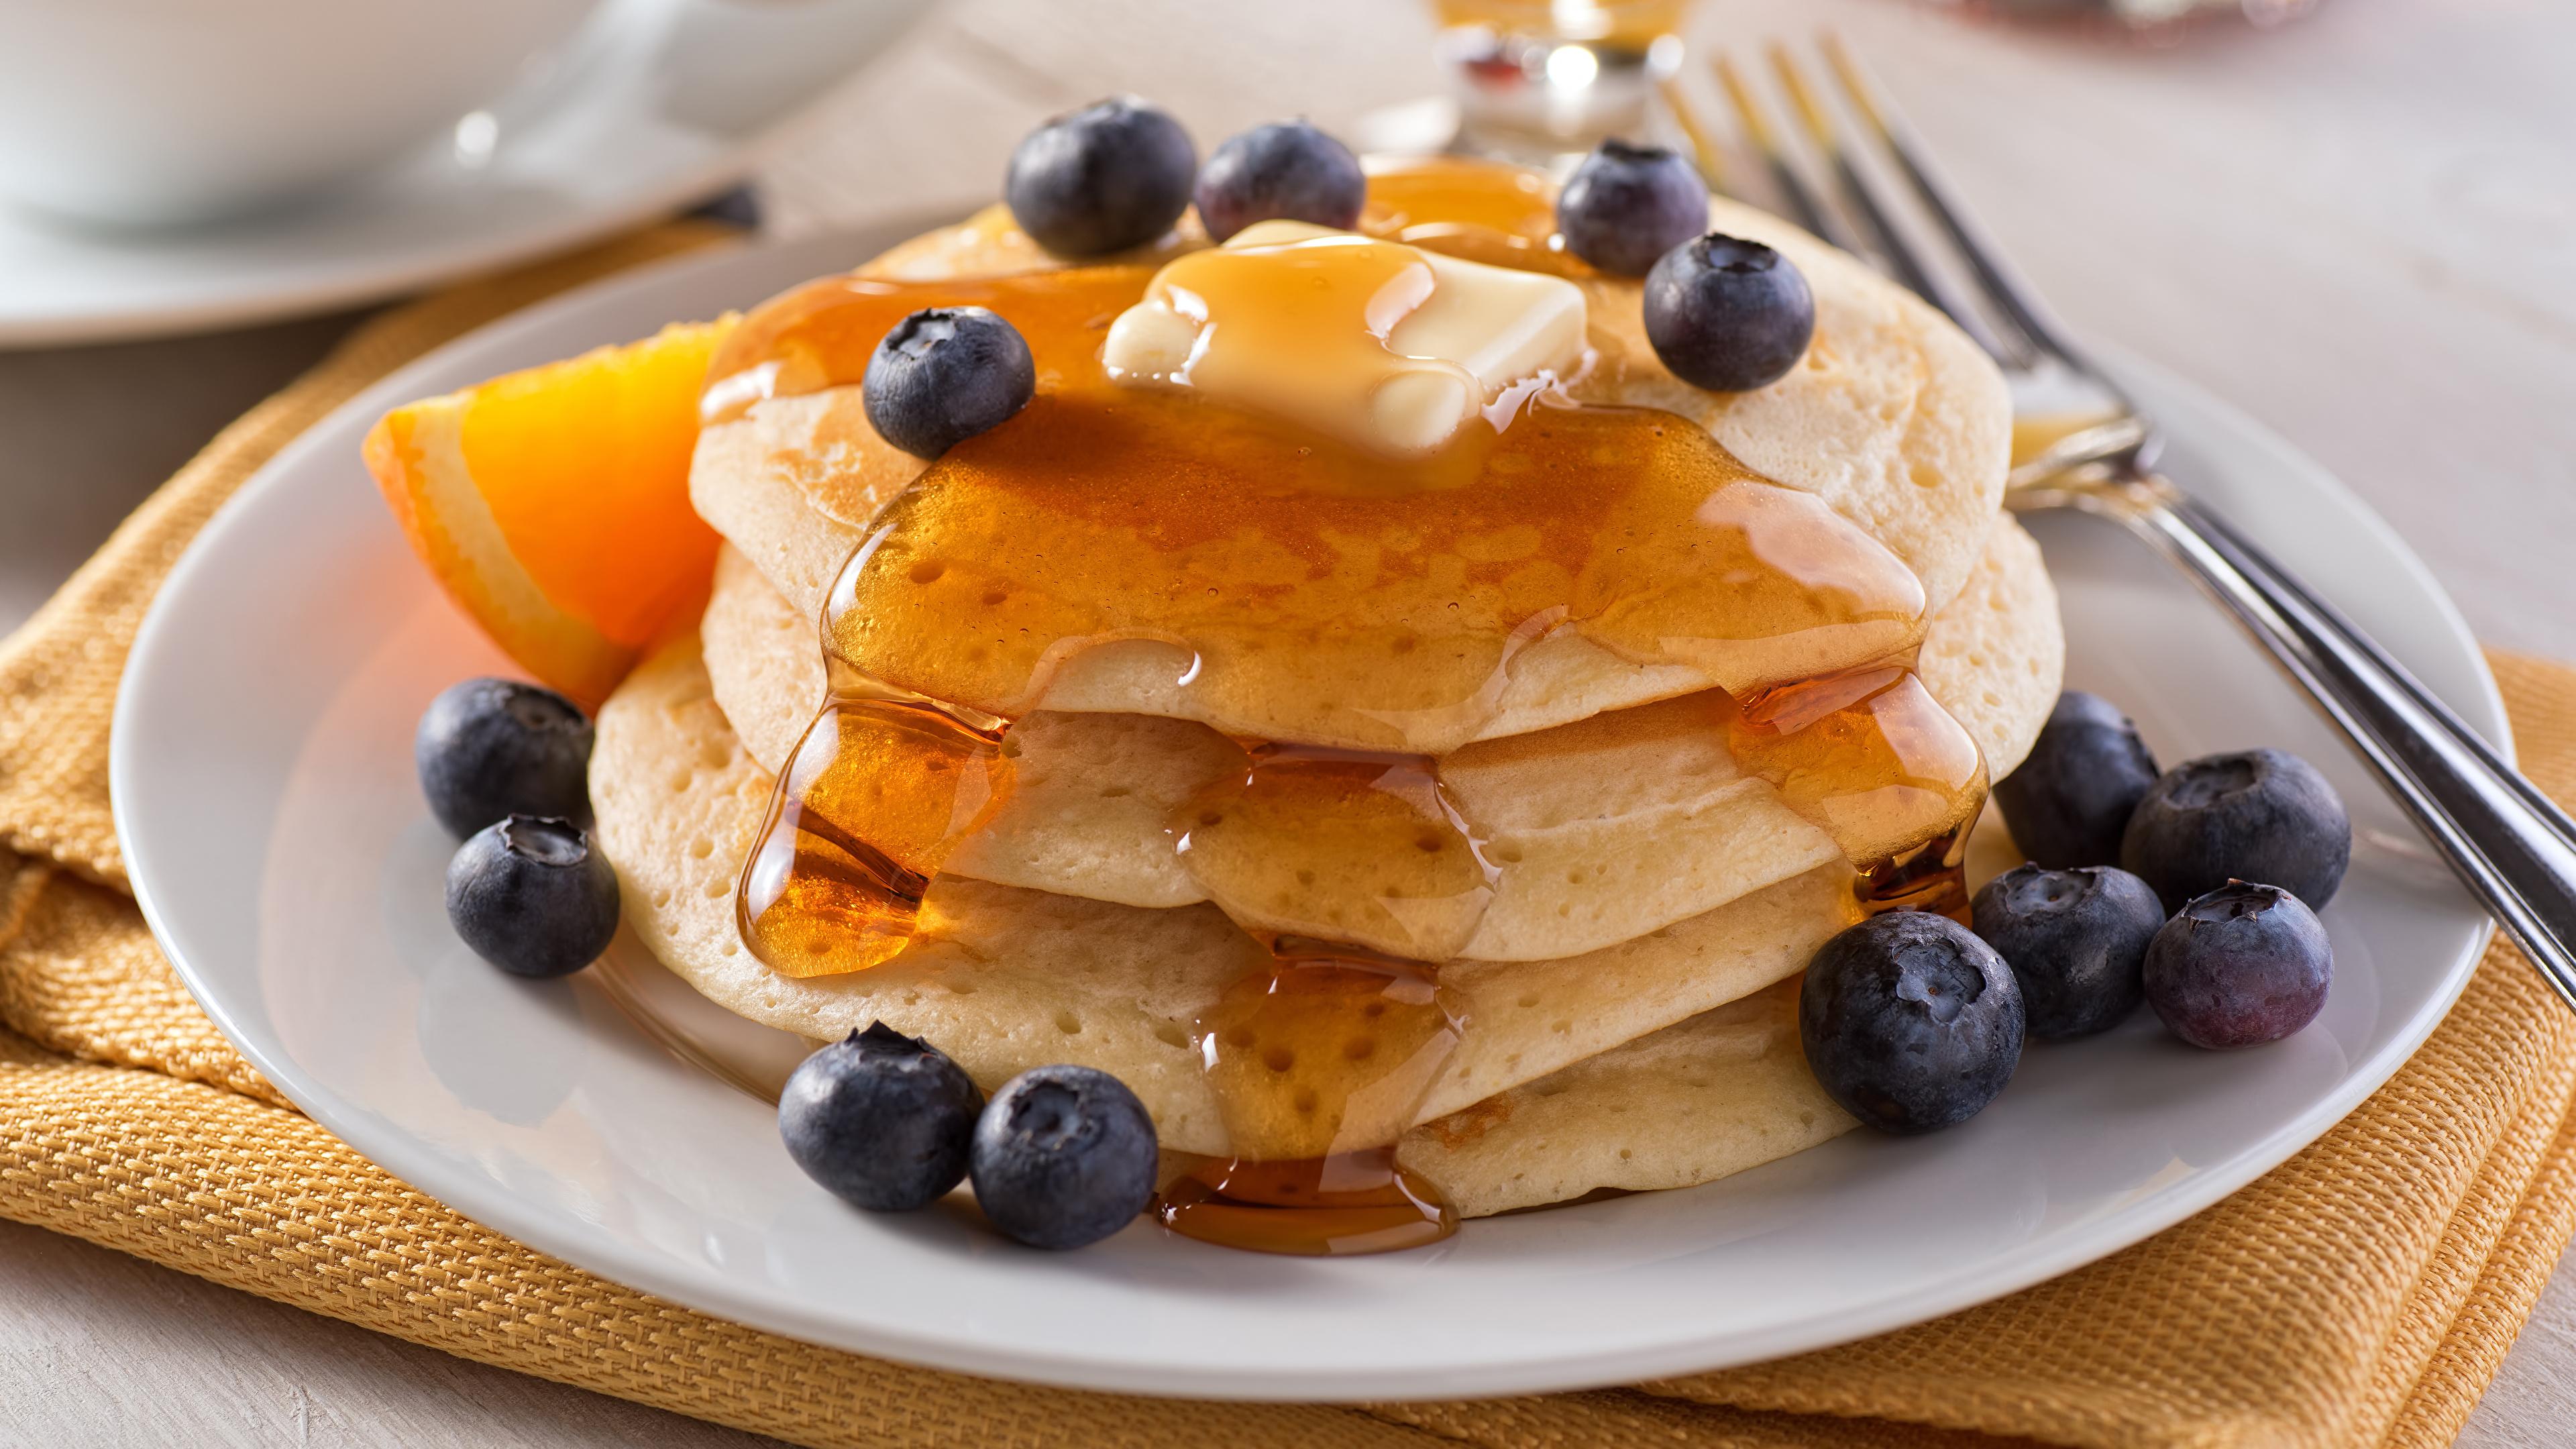 Картинка Мед Блины Черника Еда Тарелка 3840x2160 Пища тарелке Продукты питания